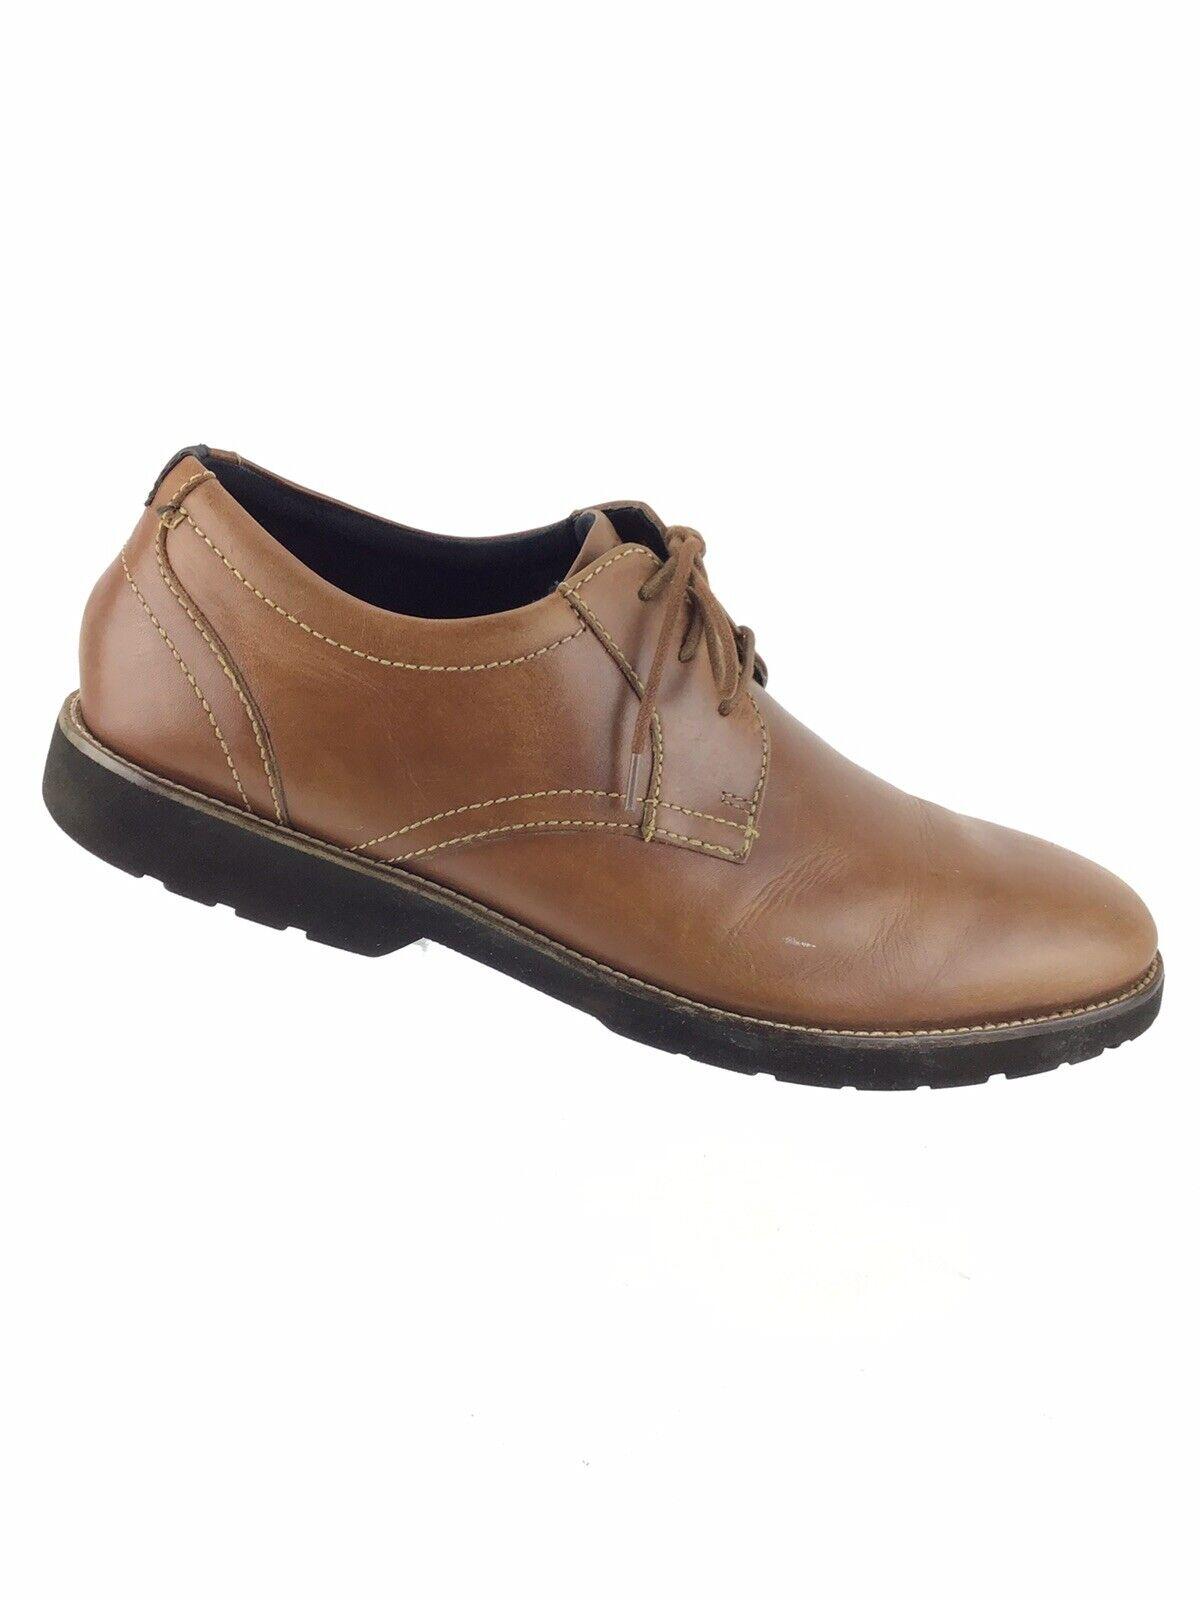 Rockport Classic Zone PT Cognac Leather Lightweight Oxfords, V79657 Men 13 M B3